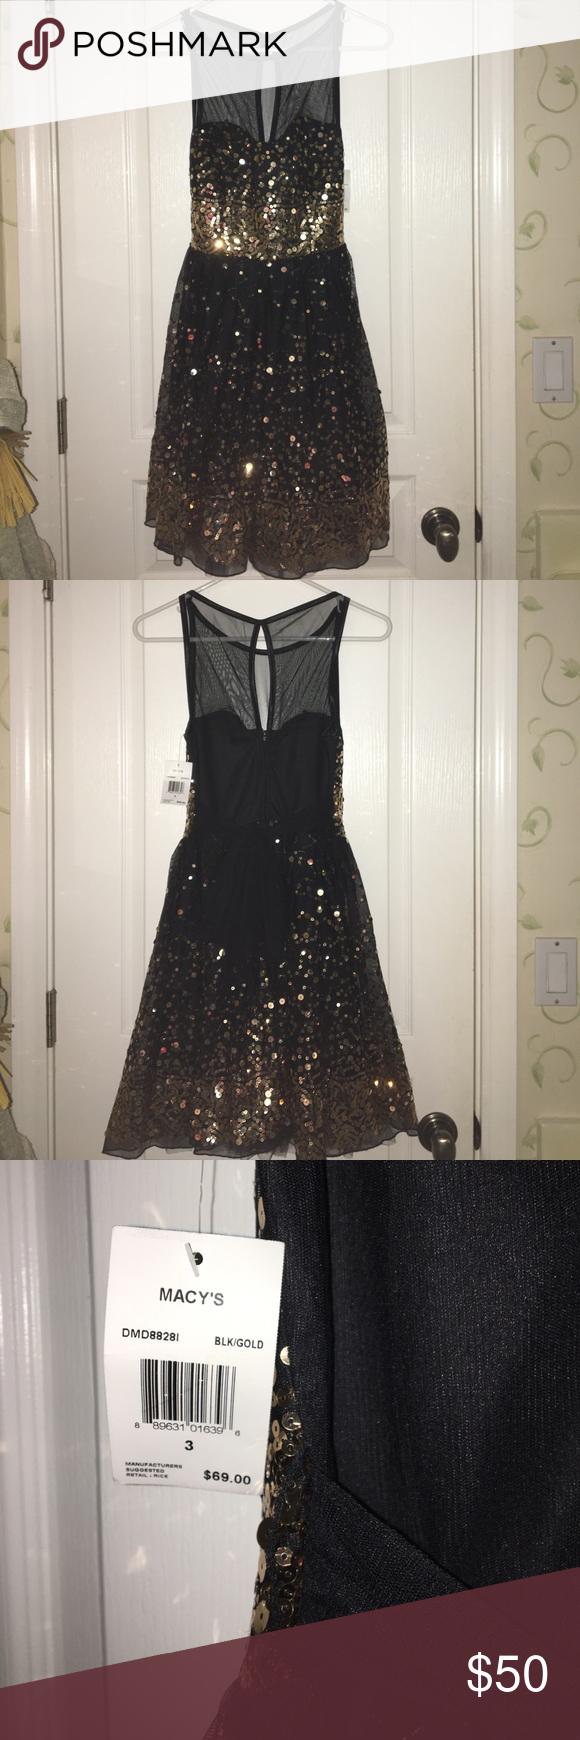 Macyus prom dress nwt pinterest dress brands prom and dress prom